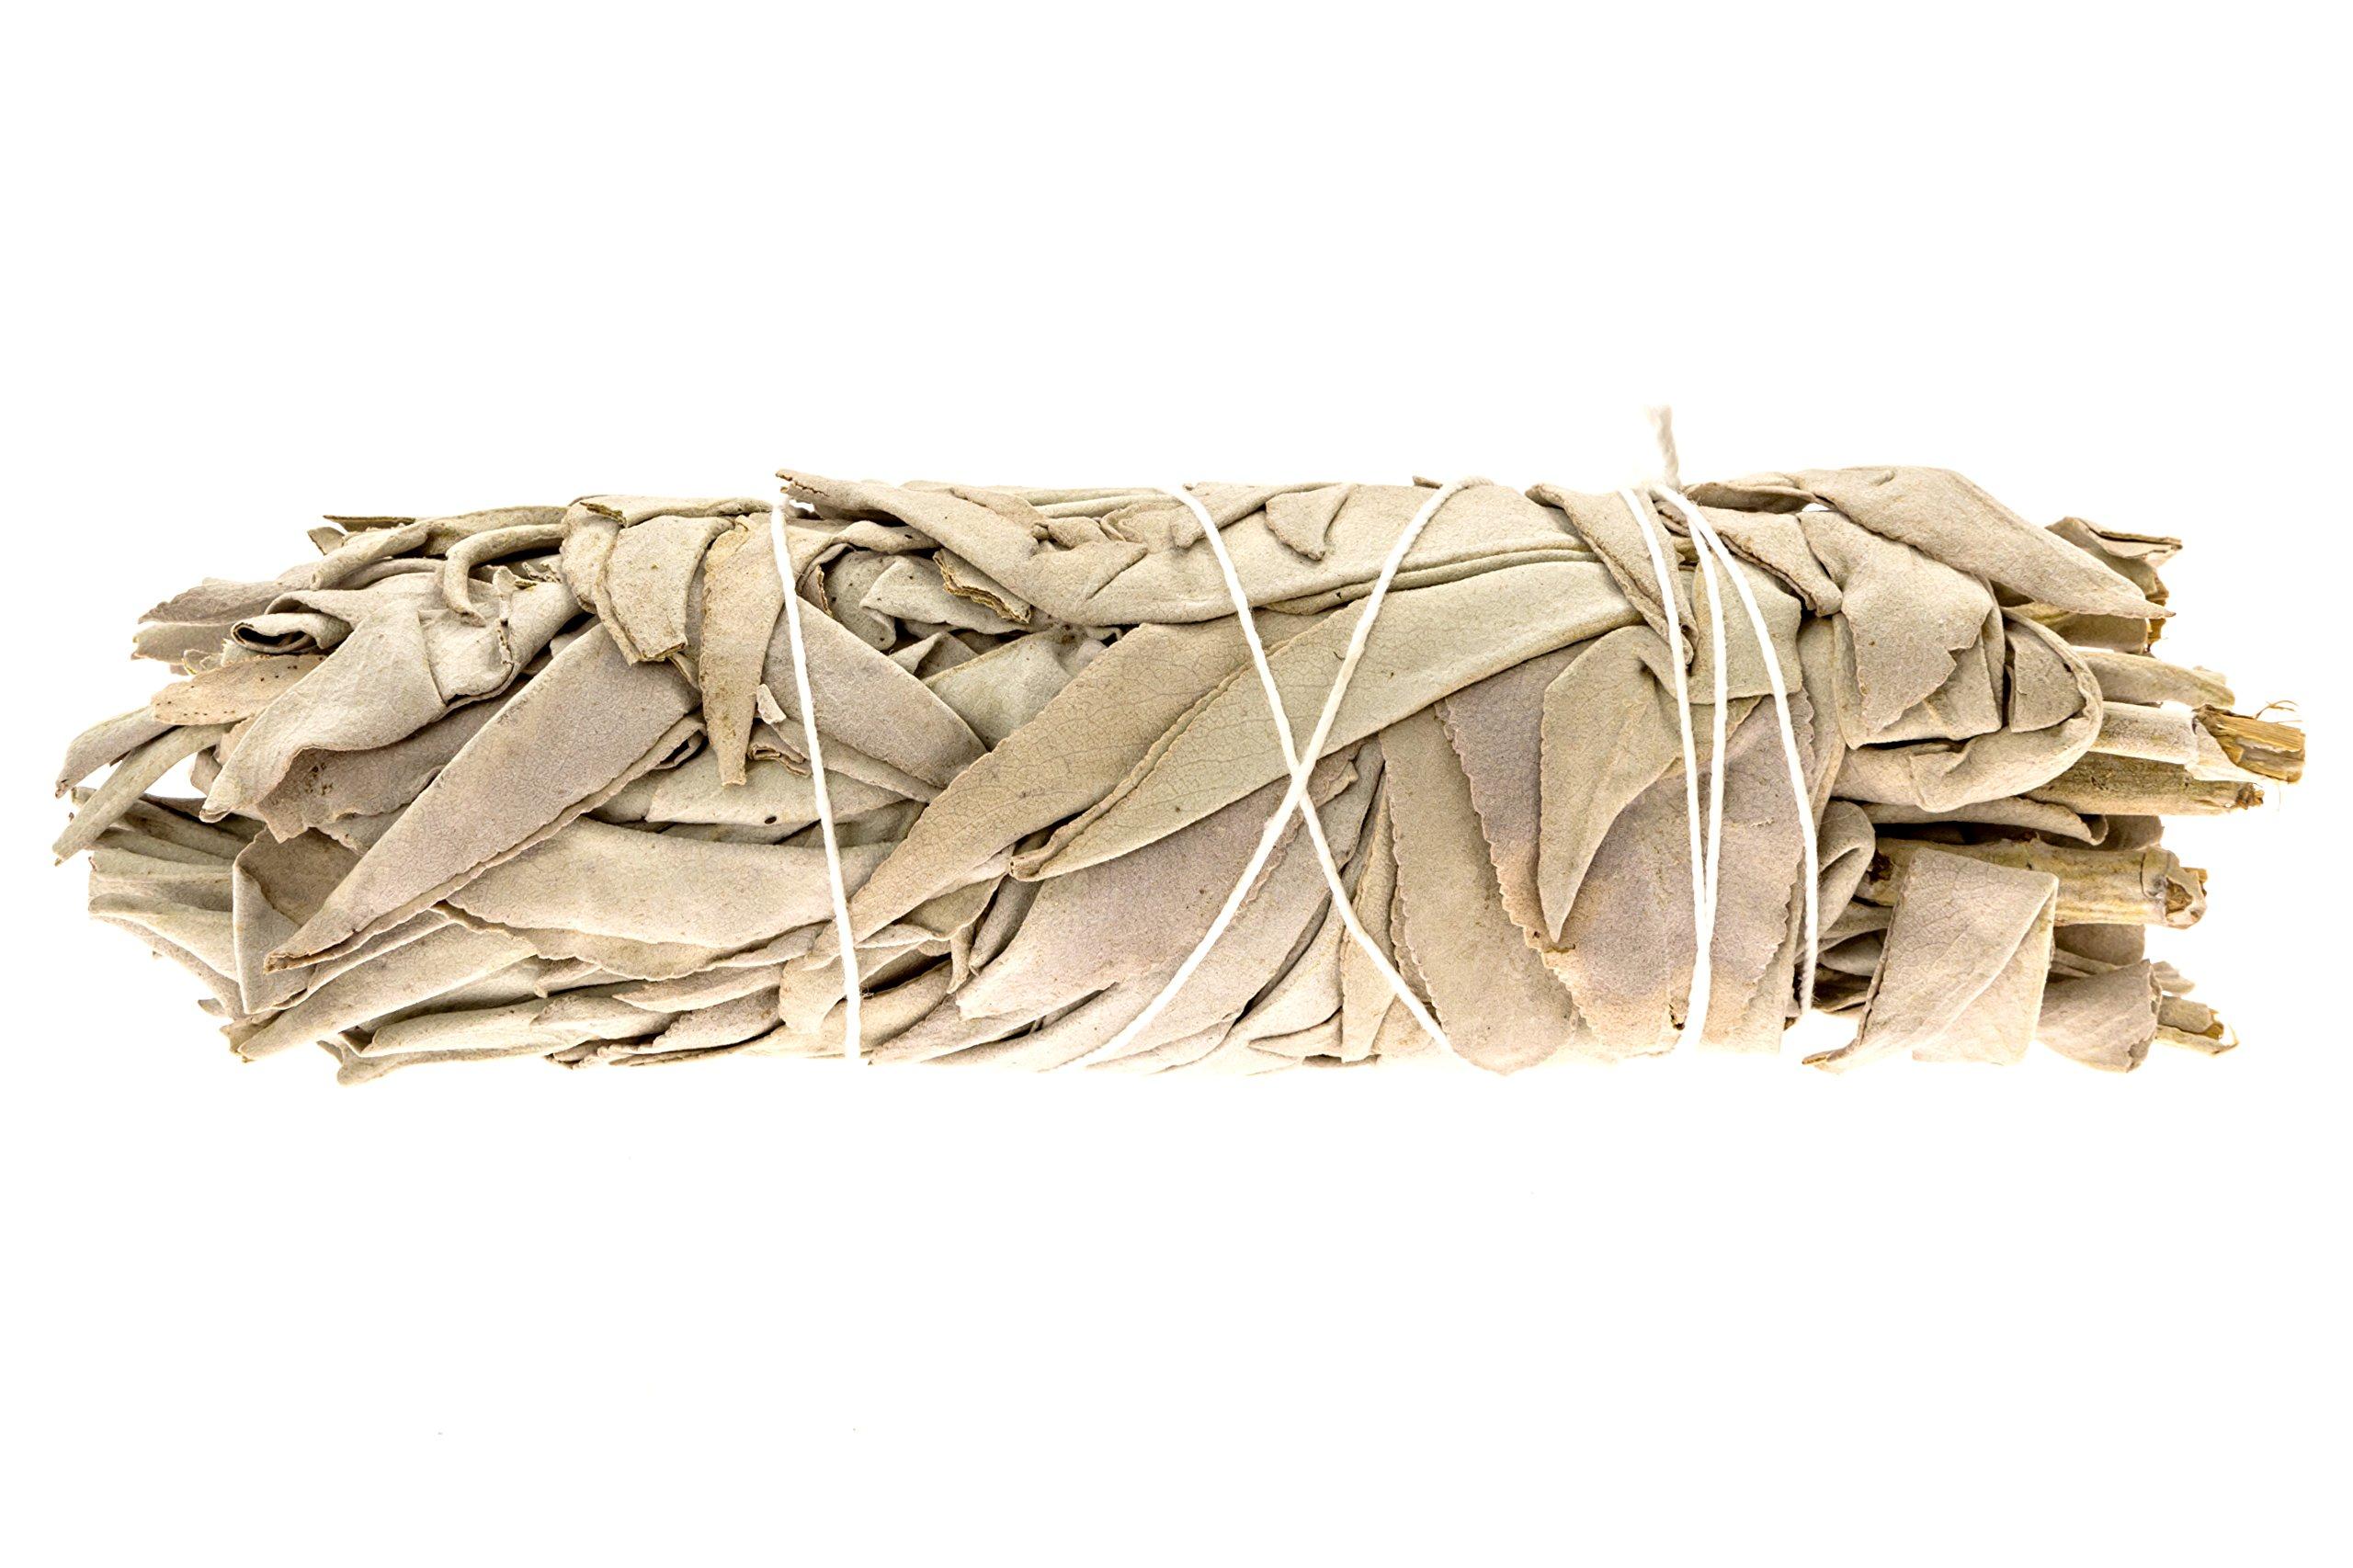 Alternative Imagination Premium California White Sage Smudge Sticks - 5 Inch Medium Sized - Package of 3 by Alternative Imagination (Image #2)